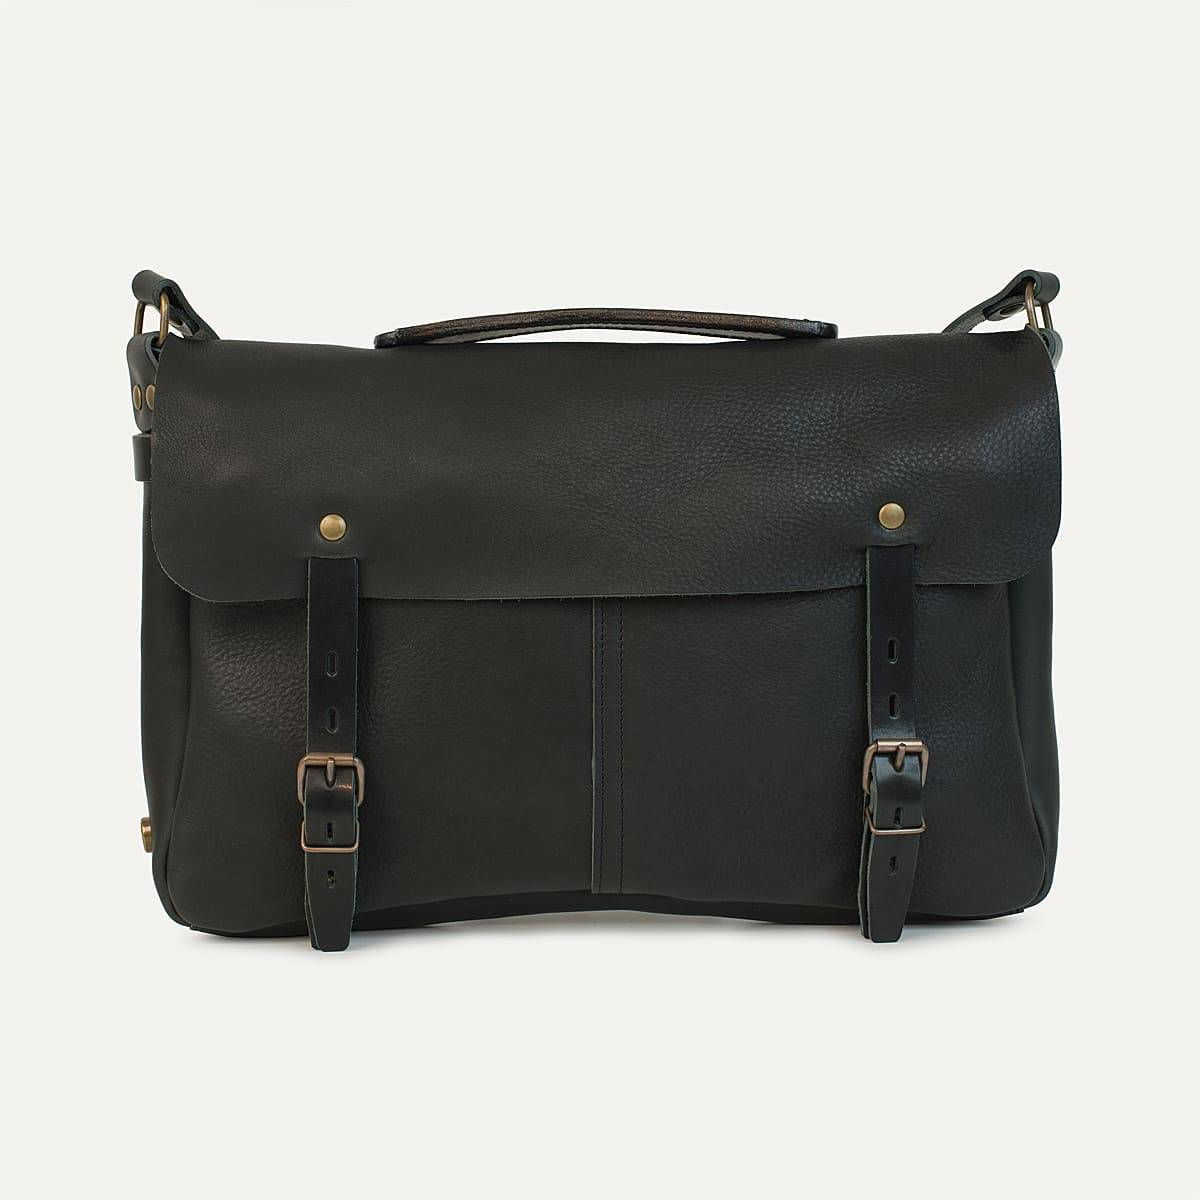 Justin plumber bag - Black (image n°1)